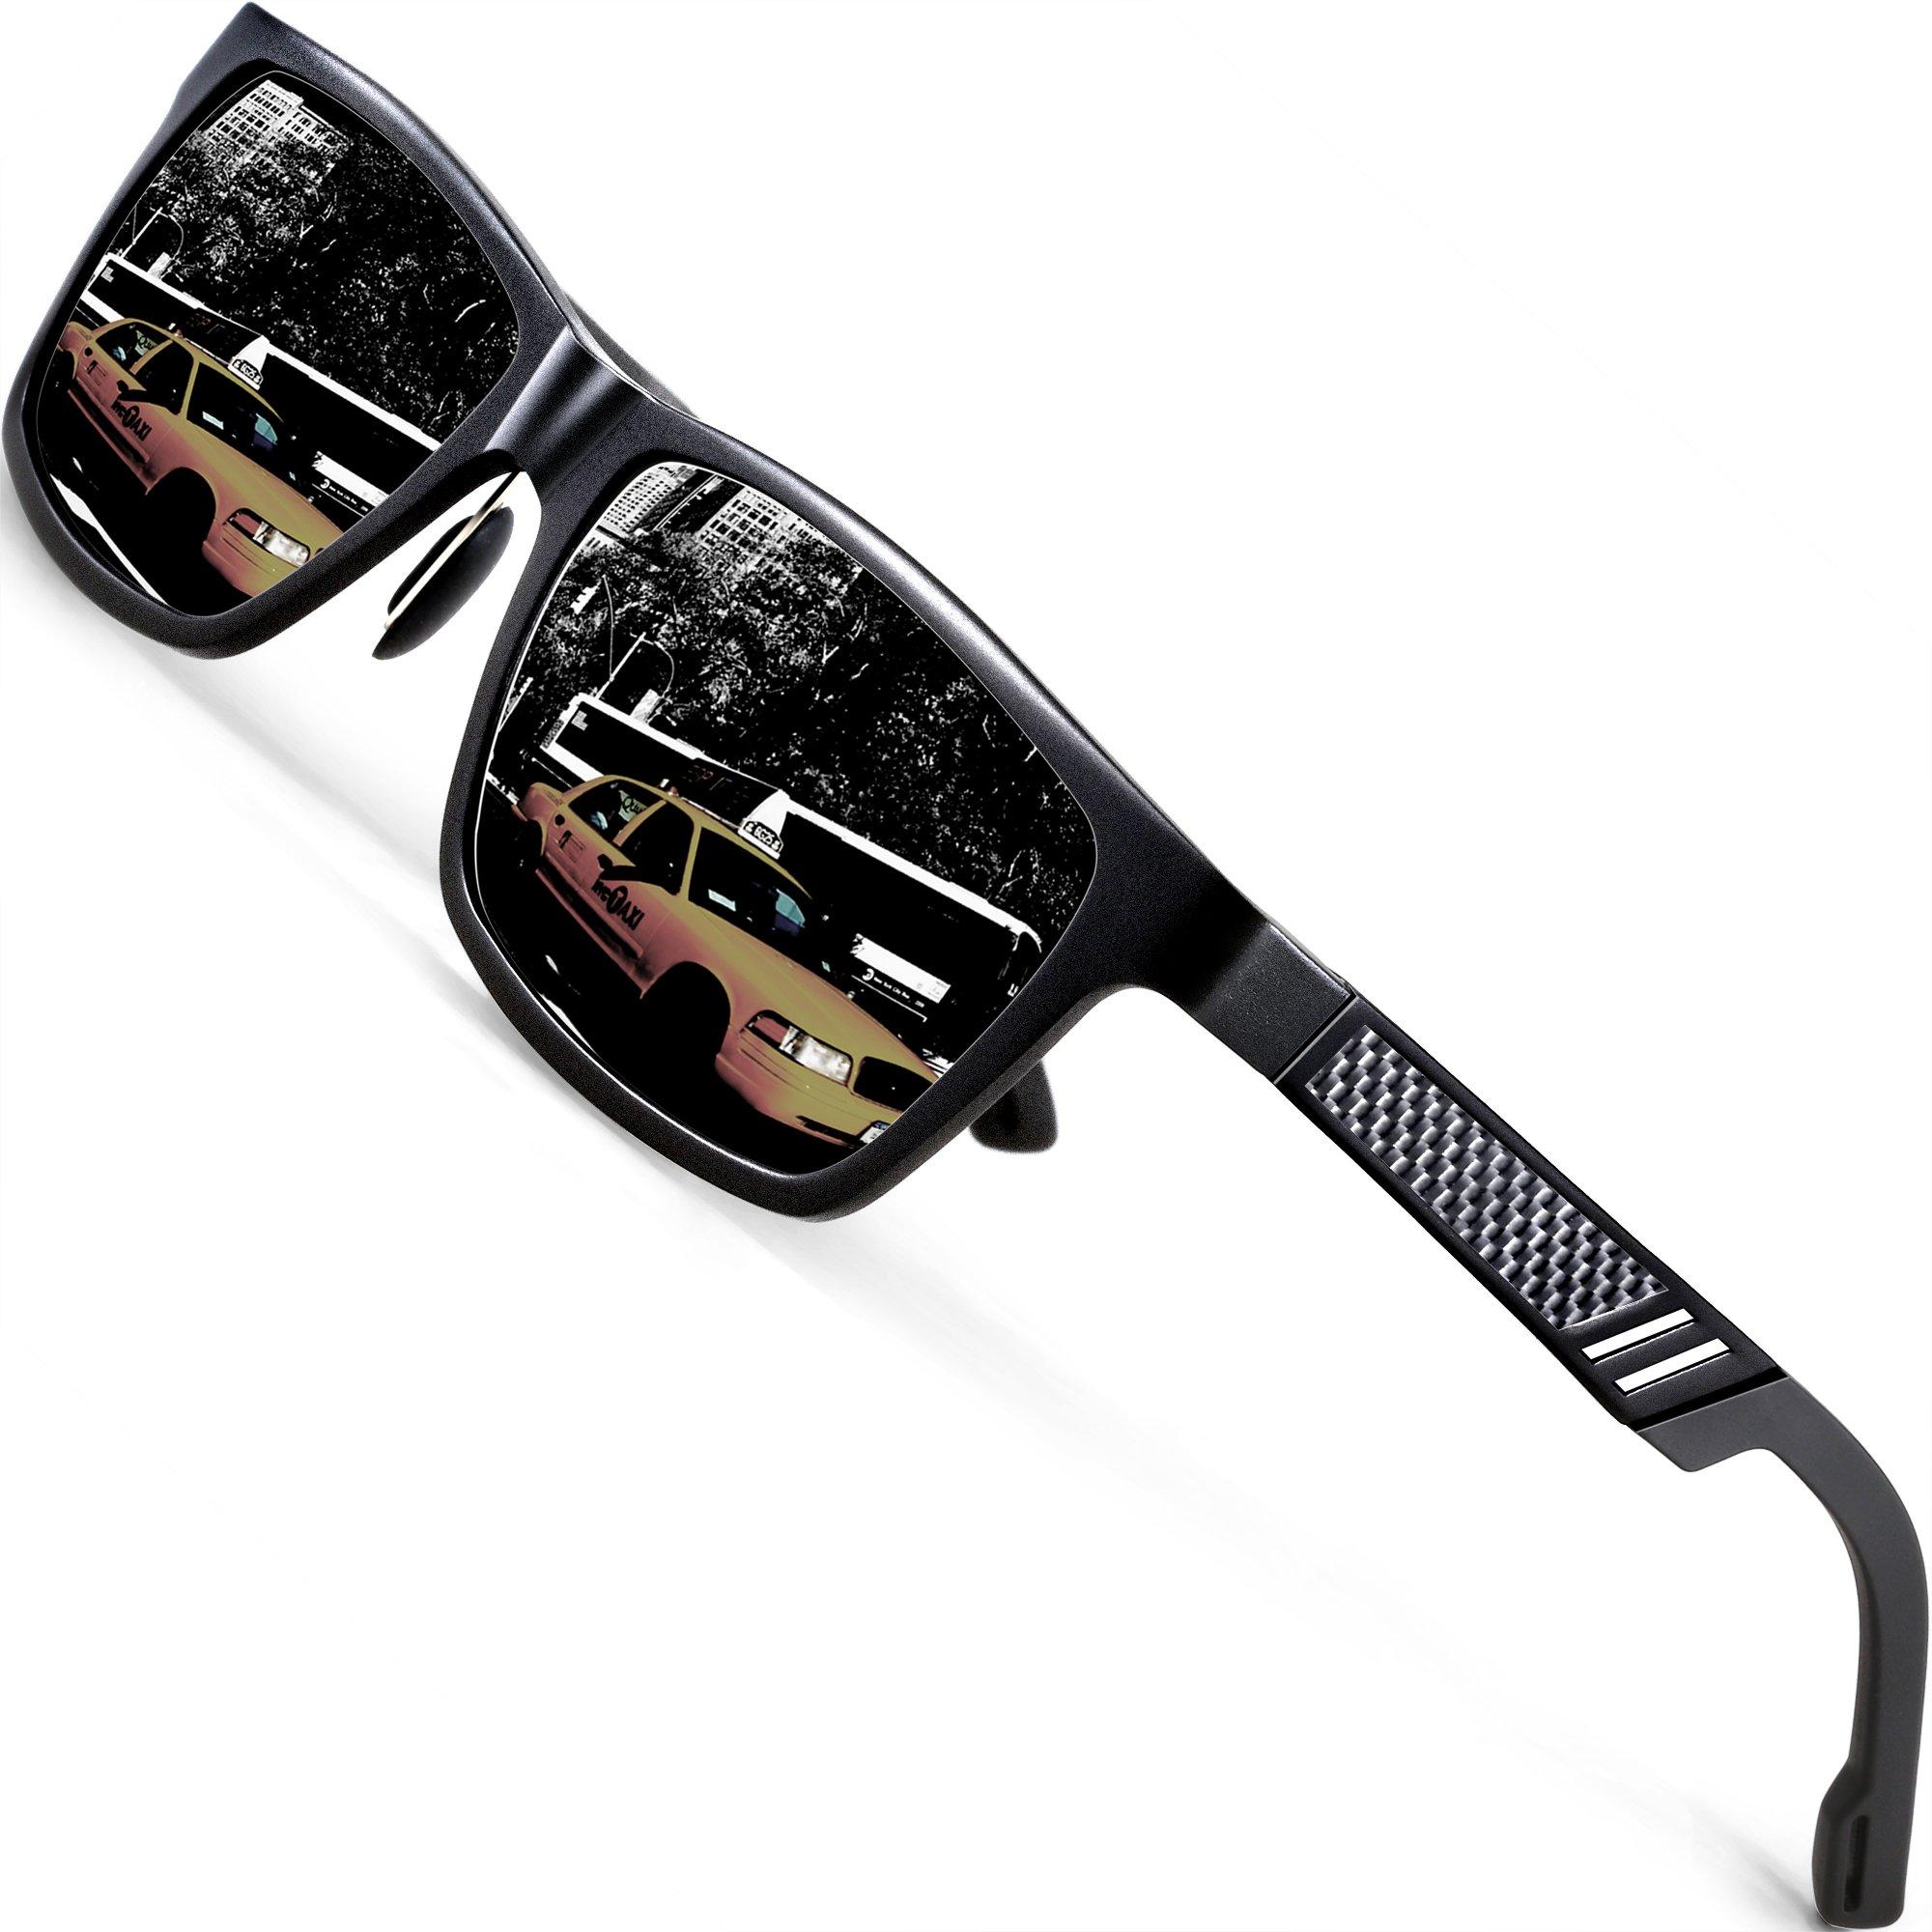 ATTCL Men's Hot Retro Al-Mg Metal Frame Driving Polarized Sunglasses For Men Women 16560blackgray by ATTCL